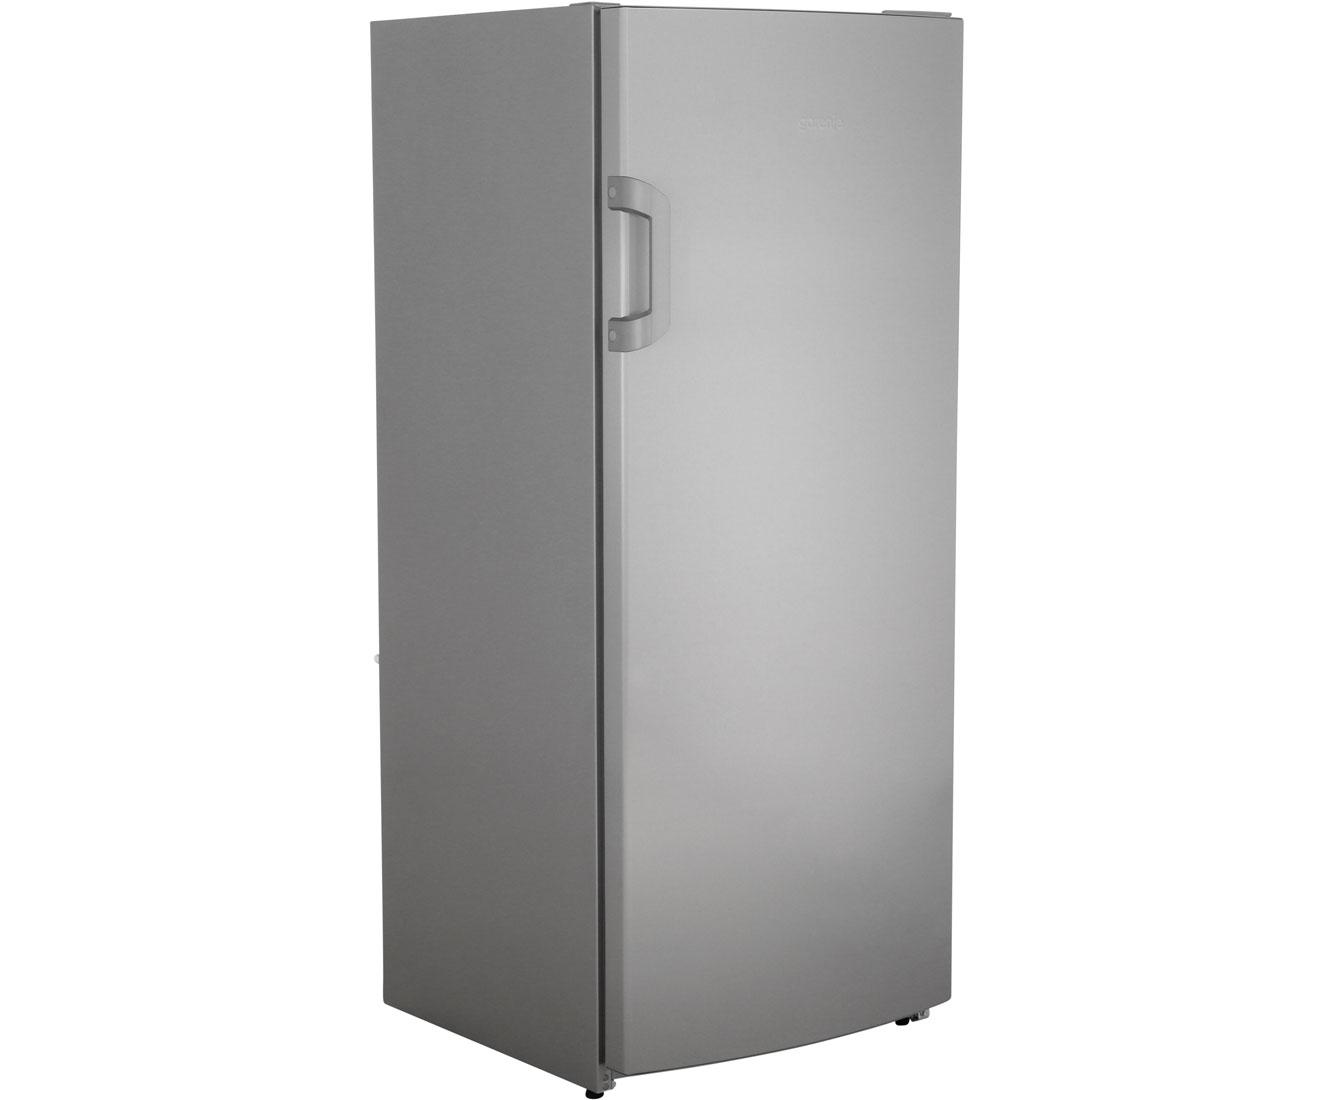 Gorenje Kühlschrank Champagne : Gorenje r6152bx kühlschrank edelstahl a